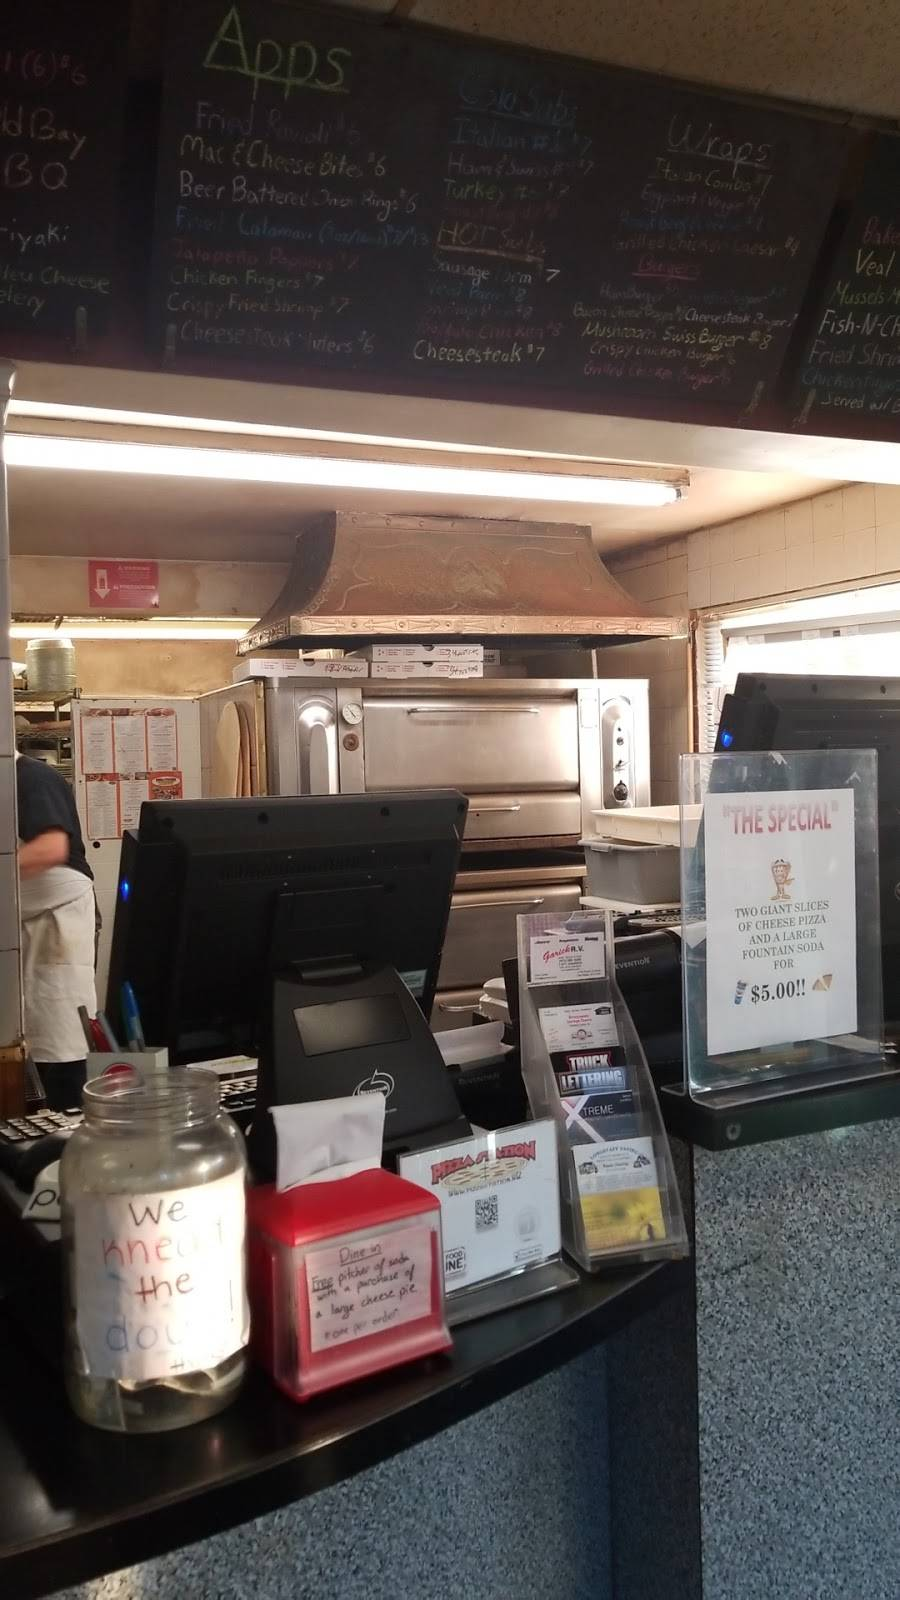 Pizza Station   restaurant   3043 Paterson Hamburg Turnpike, Oak Ridge, NJ 07461, USA   9736972222 OR +1 973-697-2222